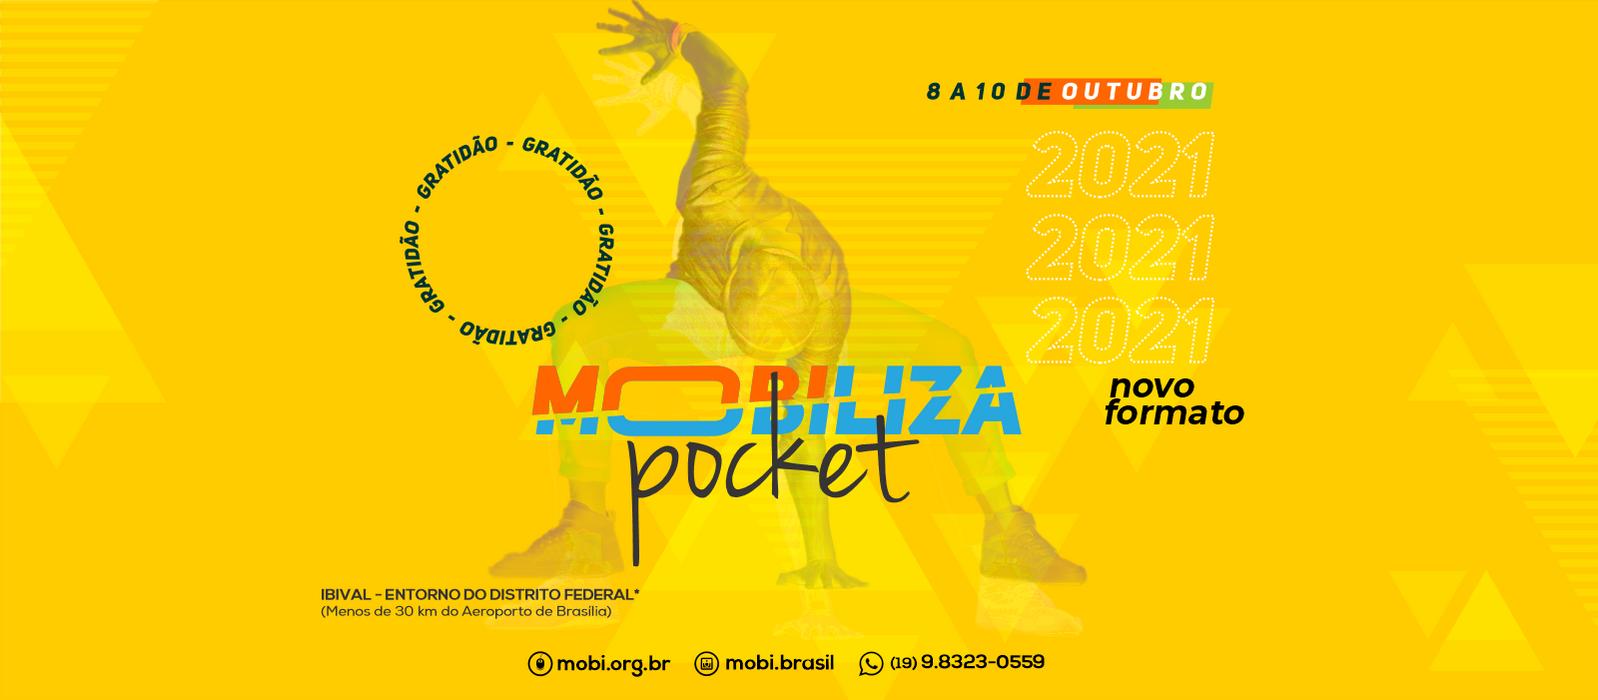 POCKET WEB 1600x700.png